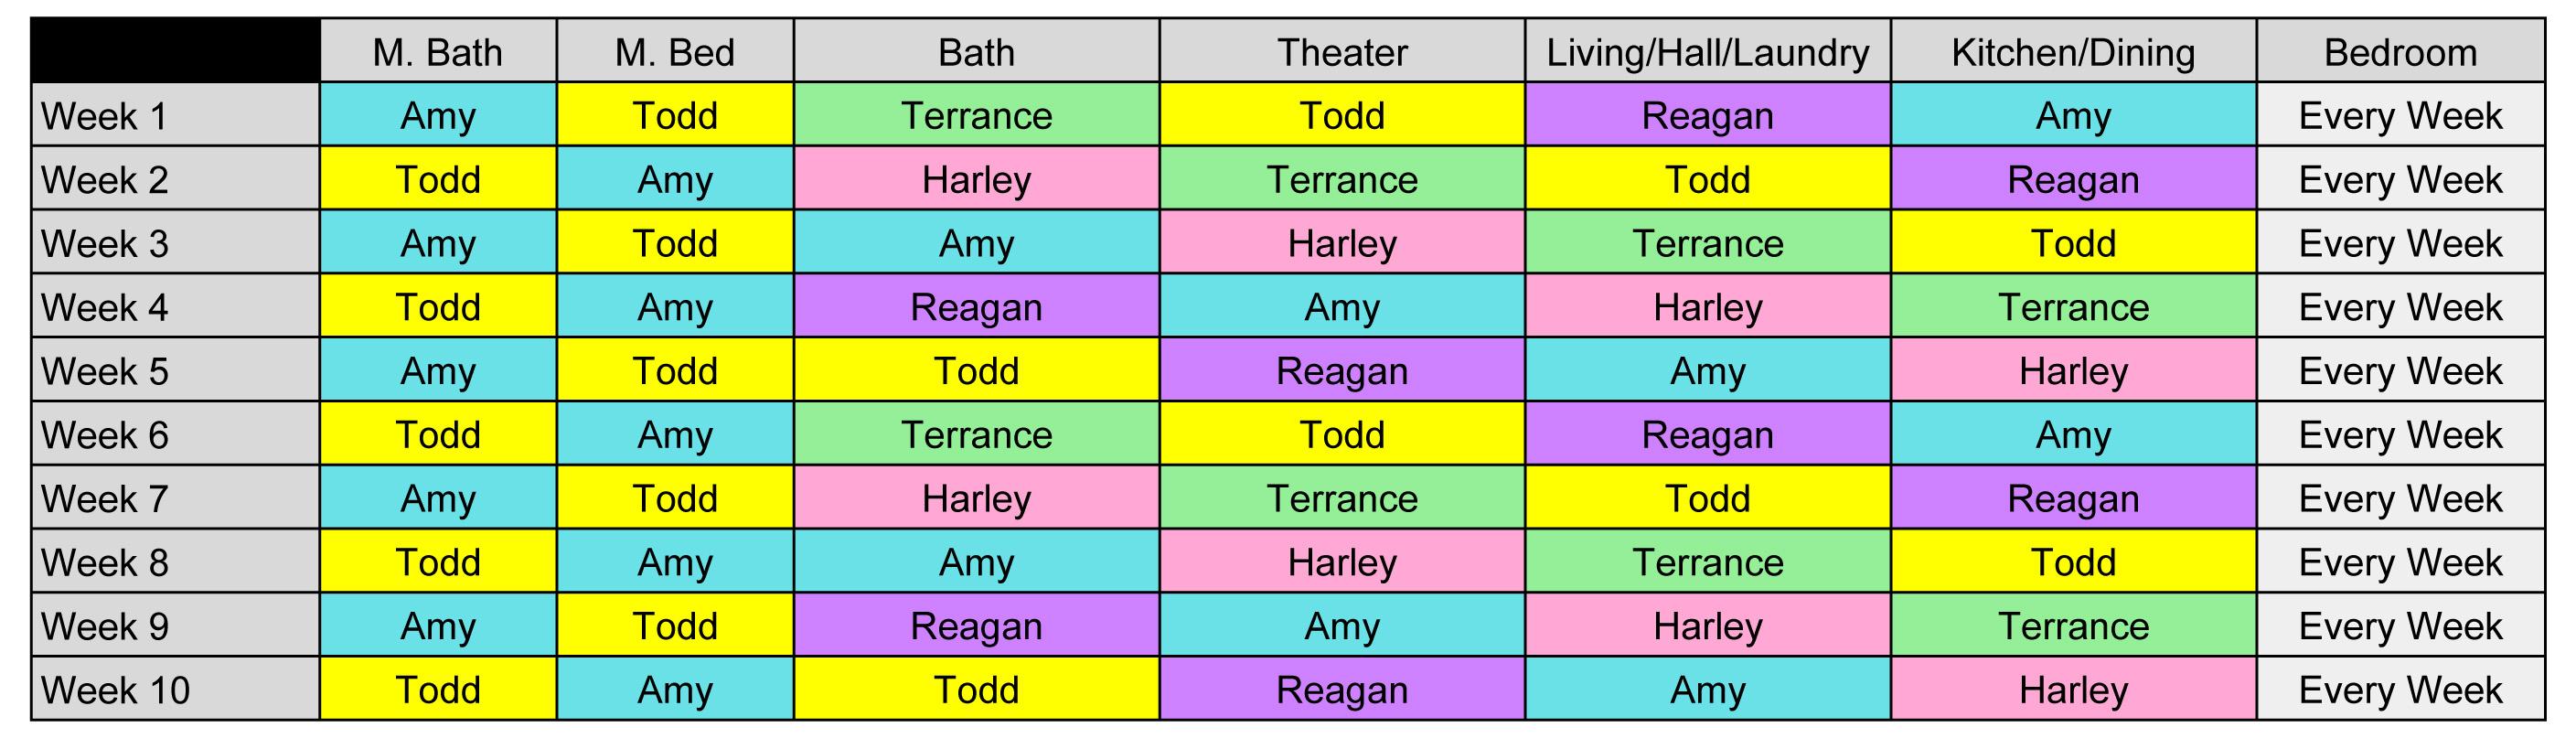 NerdCastle Schedule - Sheet1 (1)